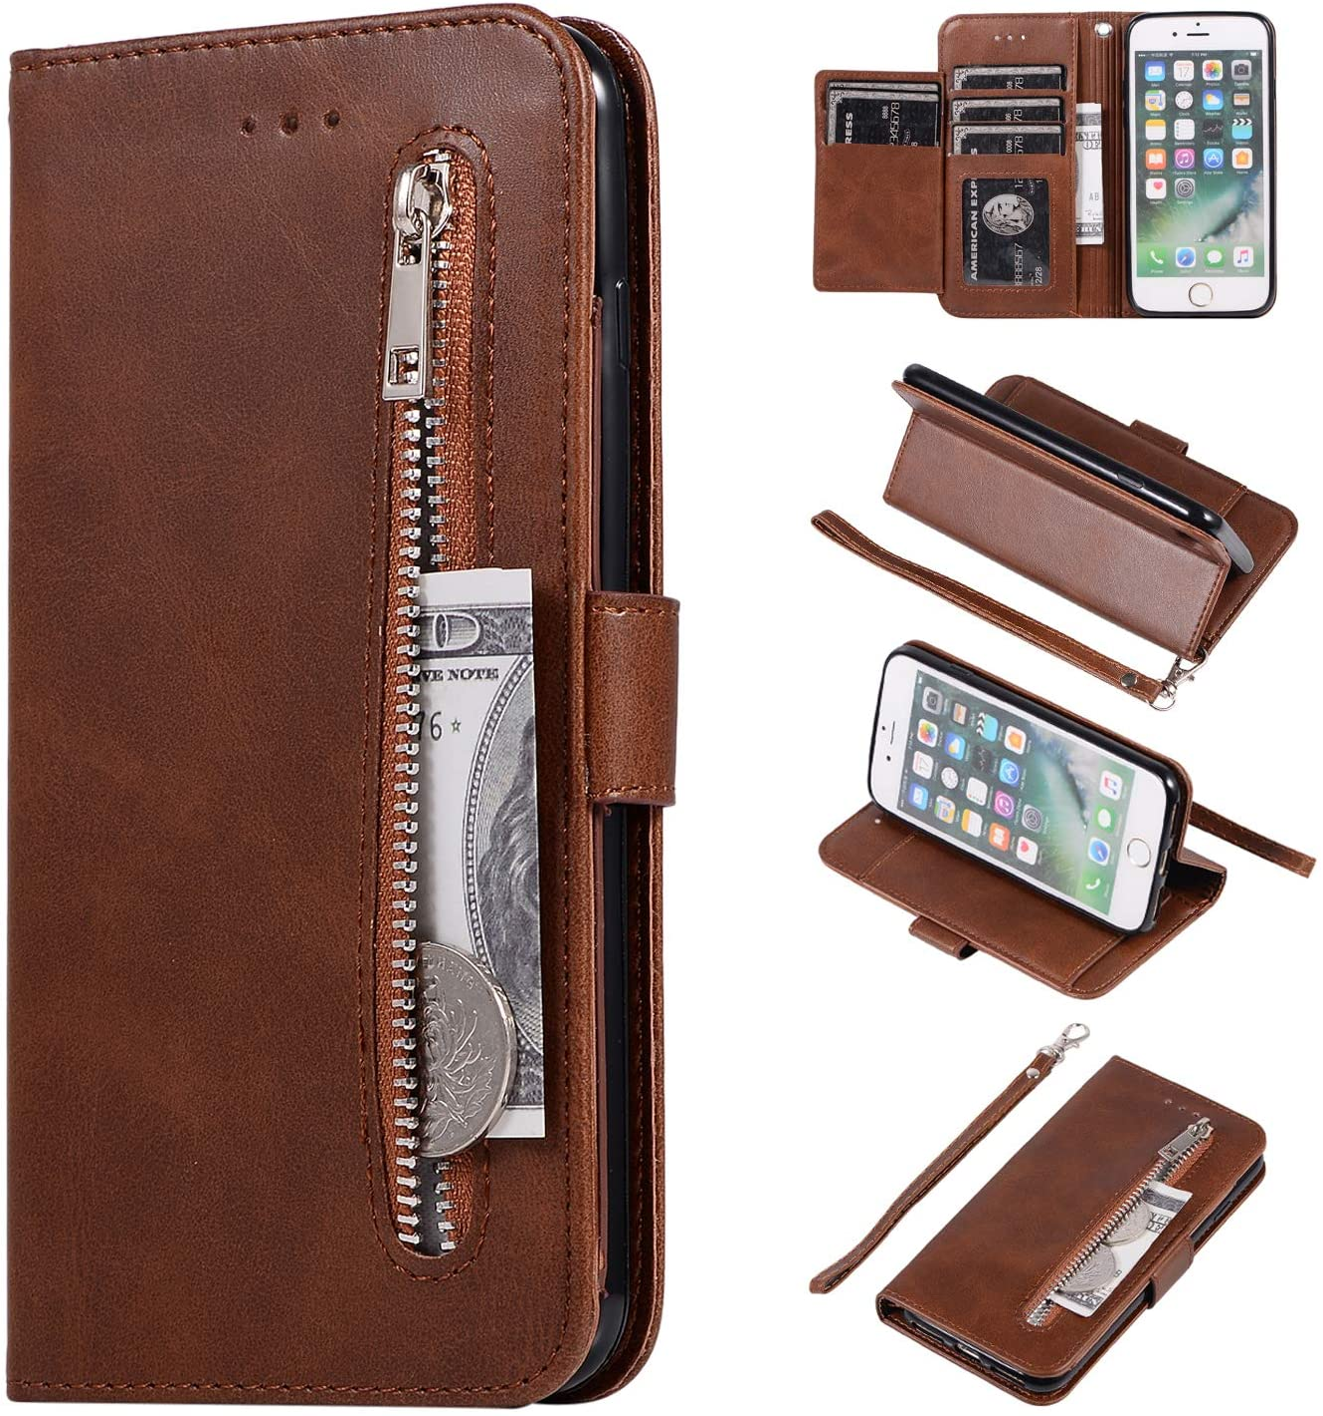 EYZUTAK Wallet Case for iPhone 8 Plus iPhone 7 Plus, 5 Card Slots Magnetic Closure Zipper Pocket Handbag PU Leather Flip Case with Wrist Strap TPU Kickstand Cover for iPhone 8 Plus iPhone 7 Plus-Brown